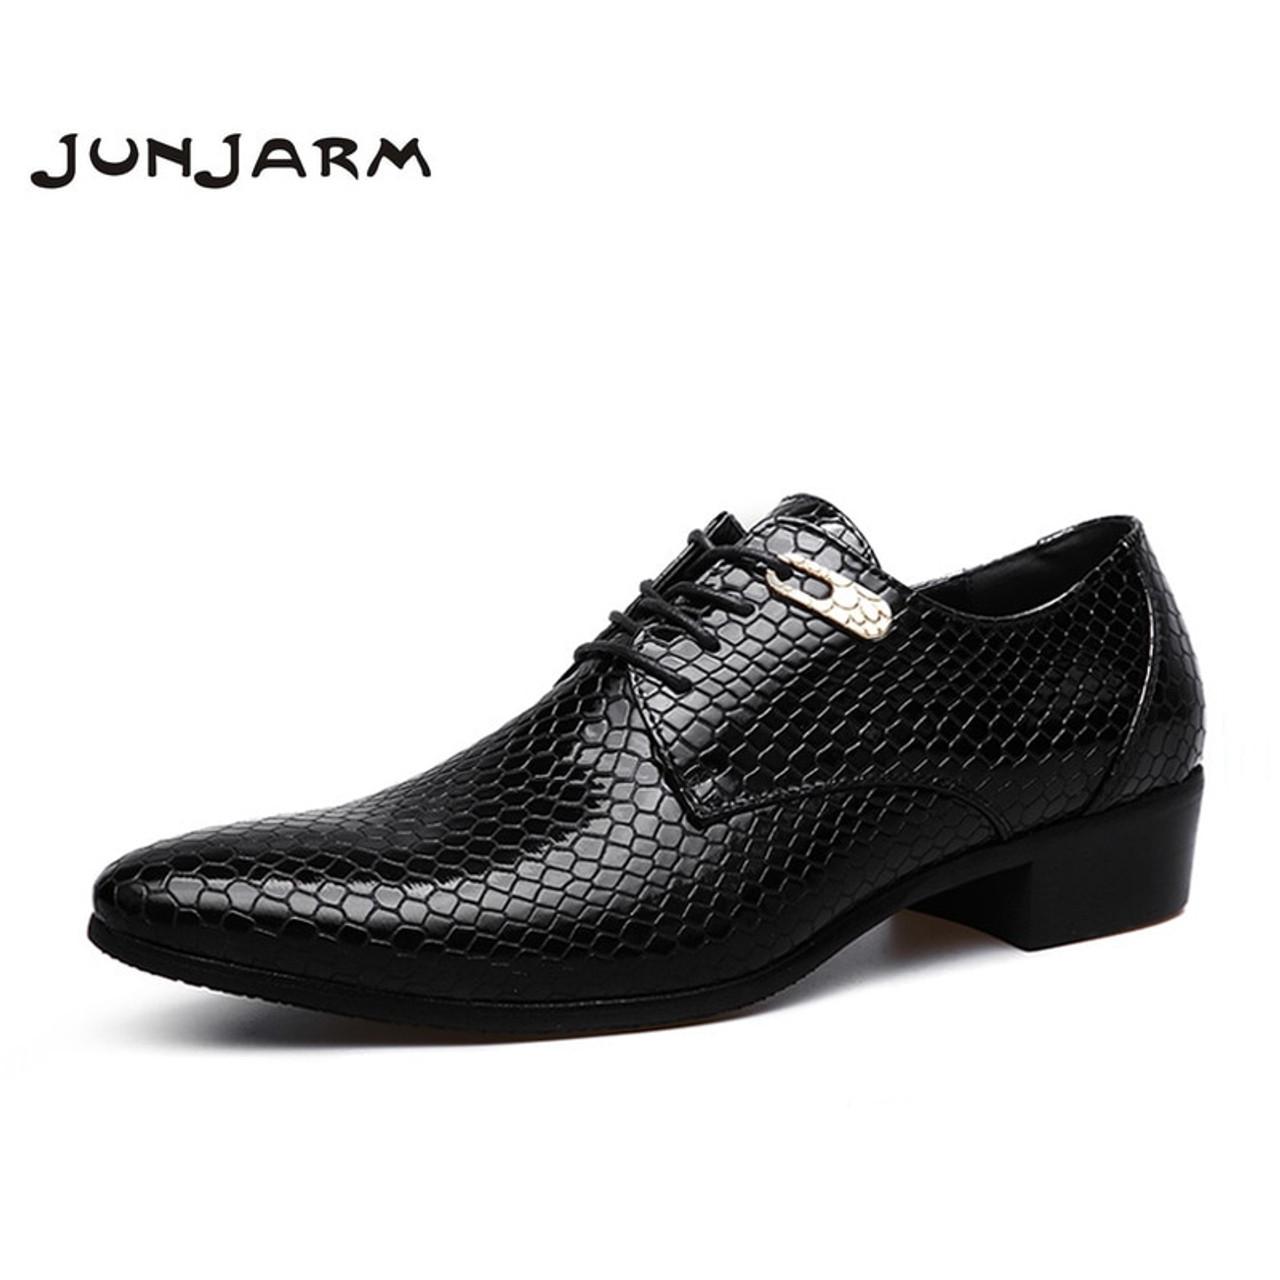 548e8d8d79 JUNJARM 2018 Brand Formal Men Dress Shoes Microfiber Oxfords Men Business  Shoes Classic Office Wedding Mens Flats Big Size 38-47